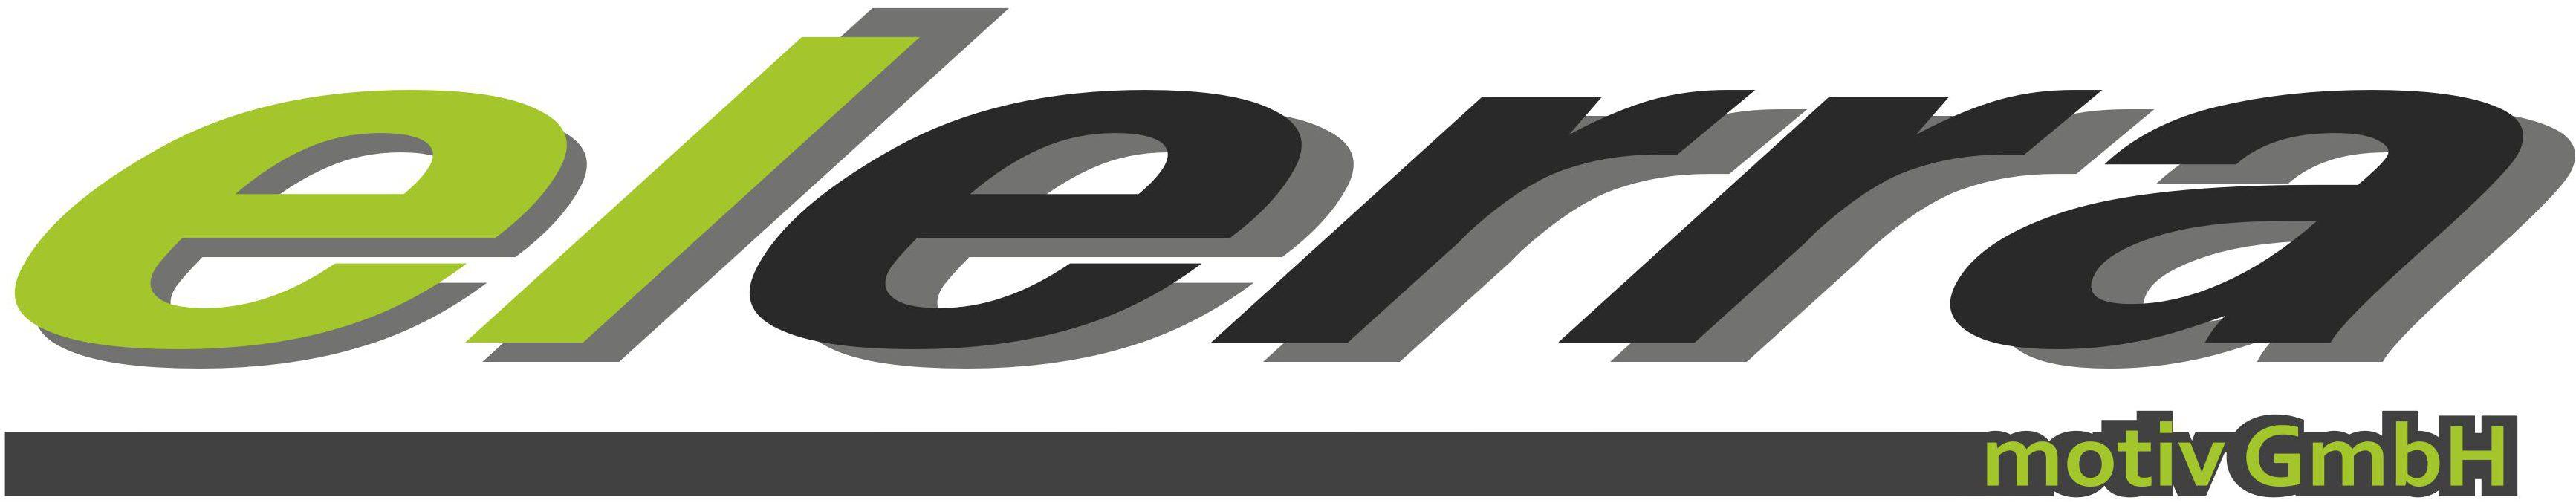 elerra motiv GmbH Shop